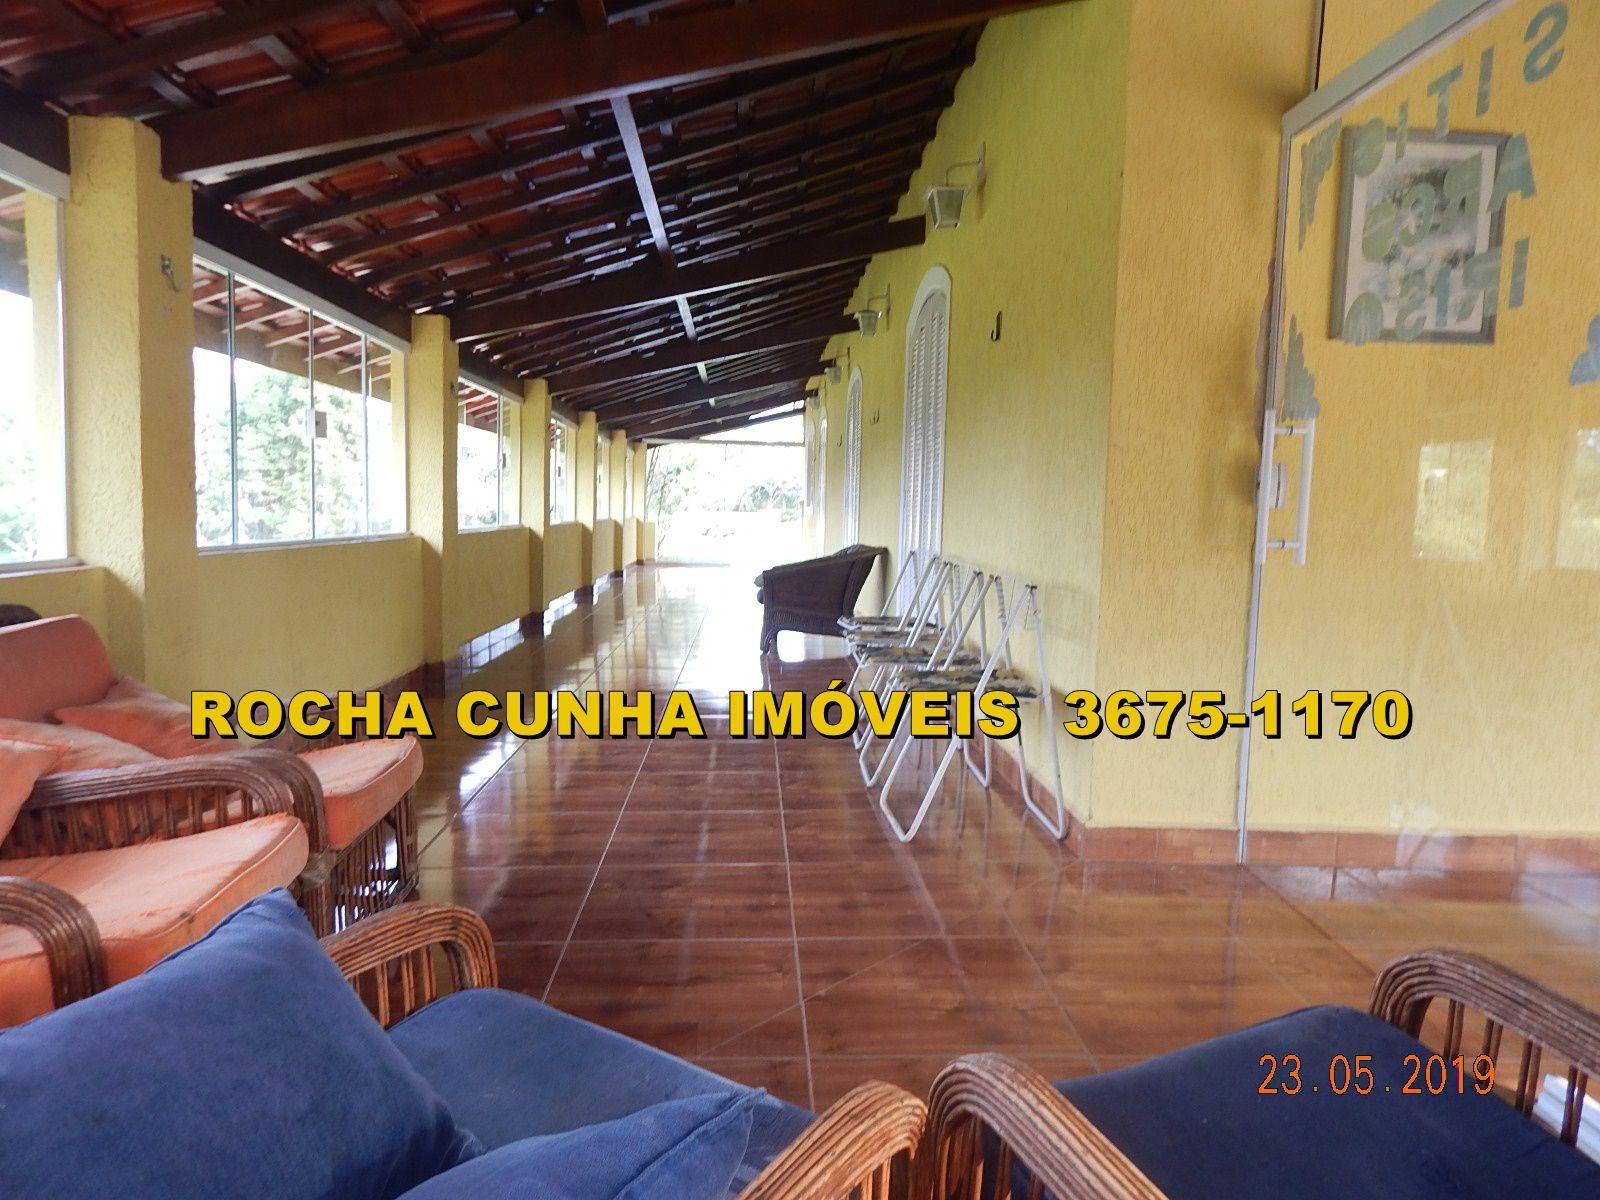 Chácara à venda Santana de Parnaíba,SP - R$ 780.000 - CHACARA0010 - 12